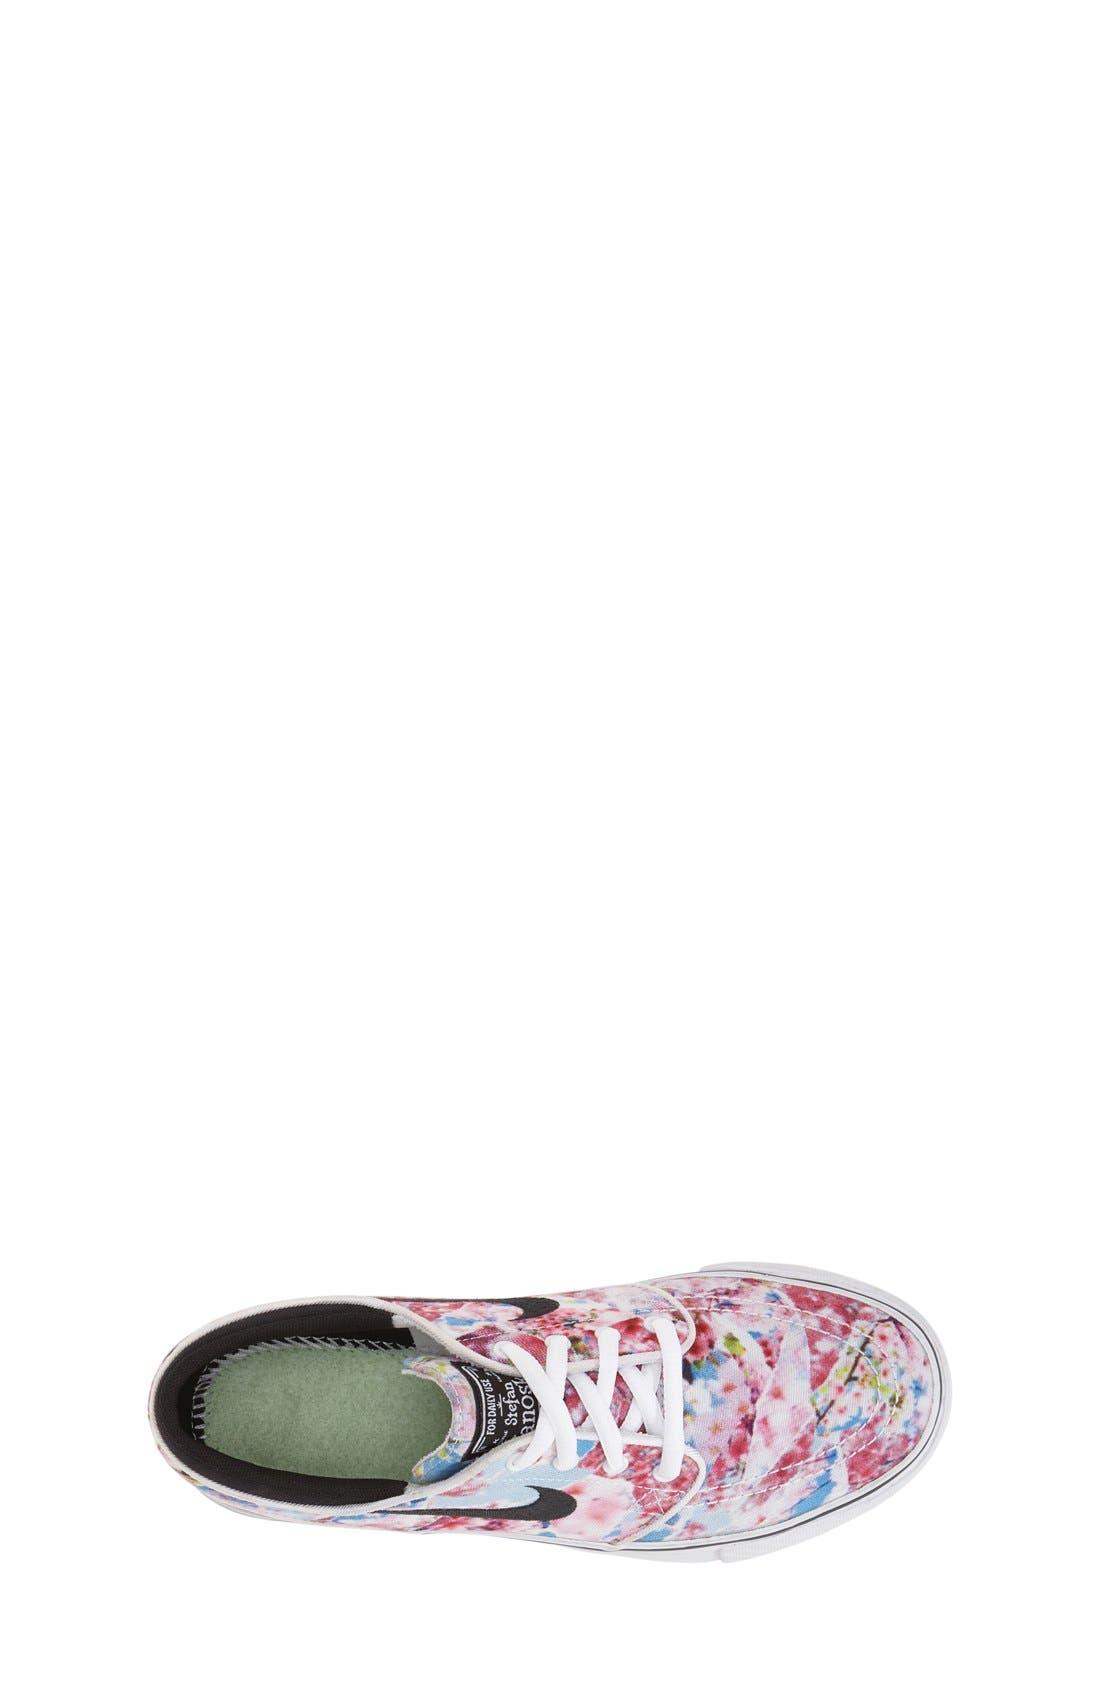 Alternate Image 3  - Nike 'Stefan Janoski' Premium Canvas Sneaker (Big Kid)